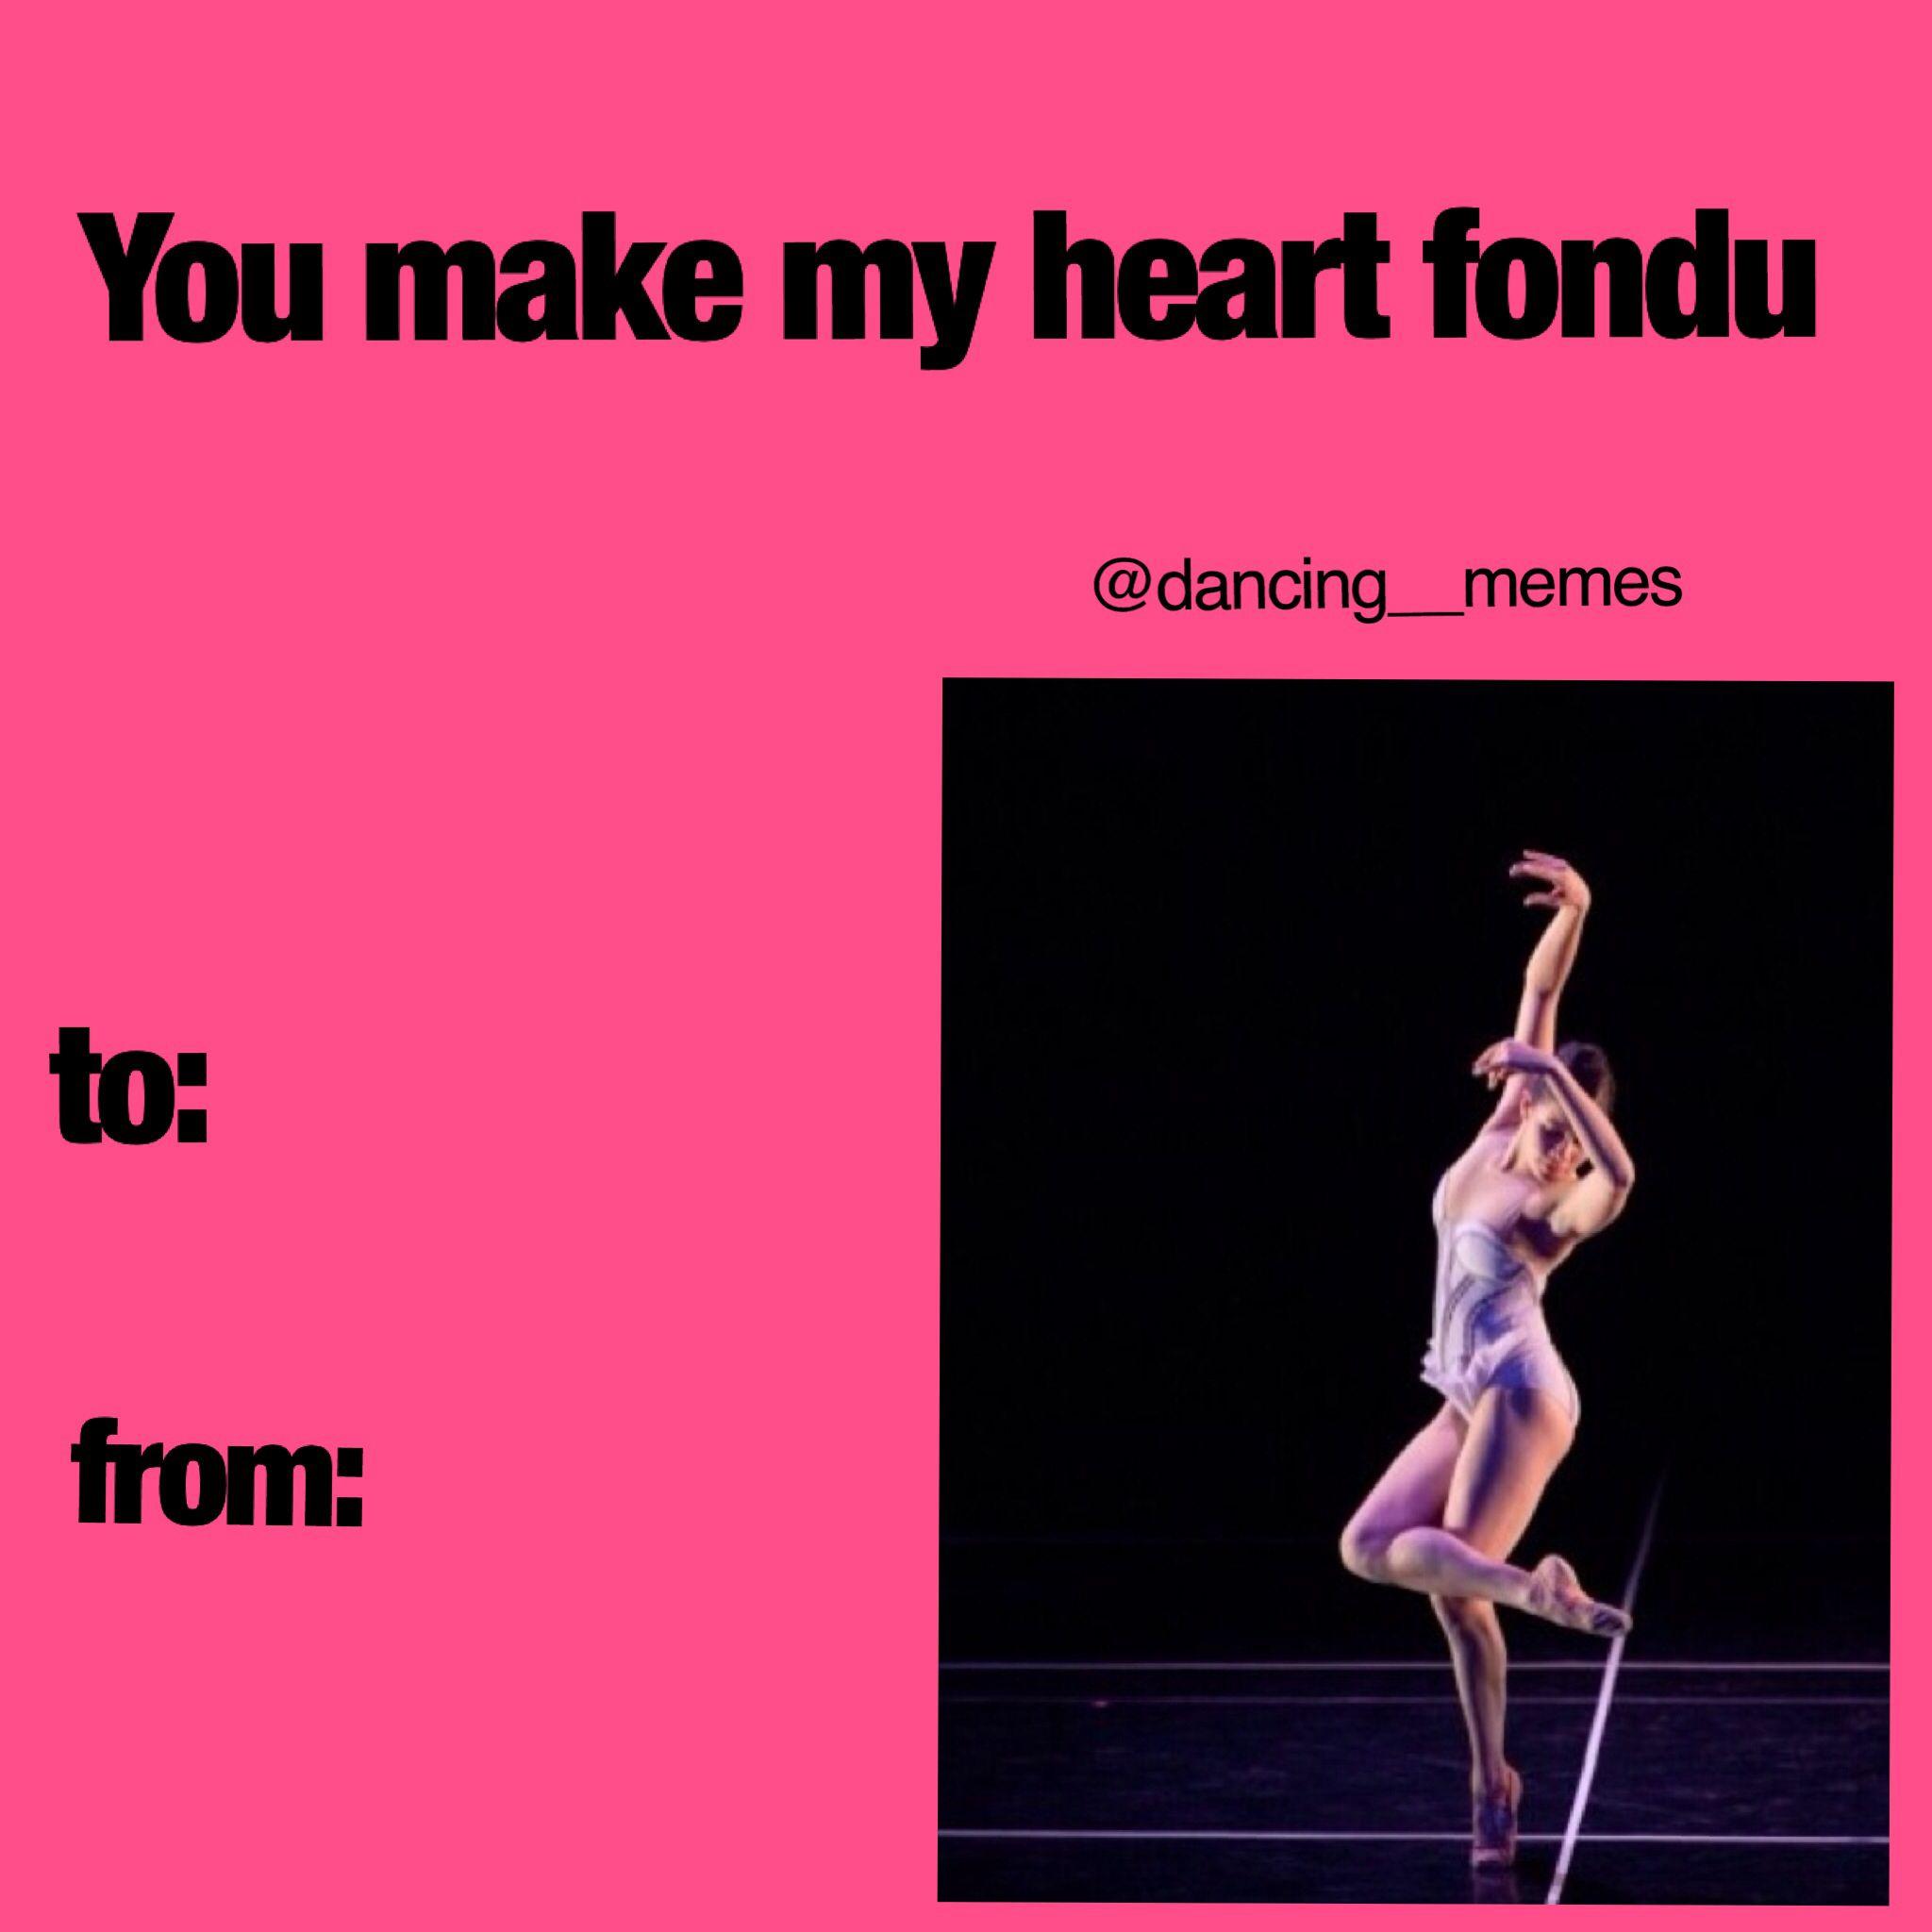 Funny Dance Meme Images : You make my heart fondu dance valentine from dancing